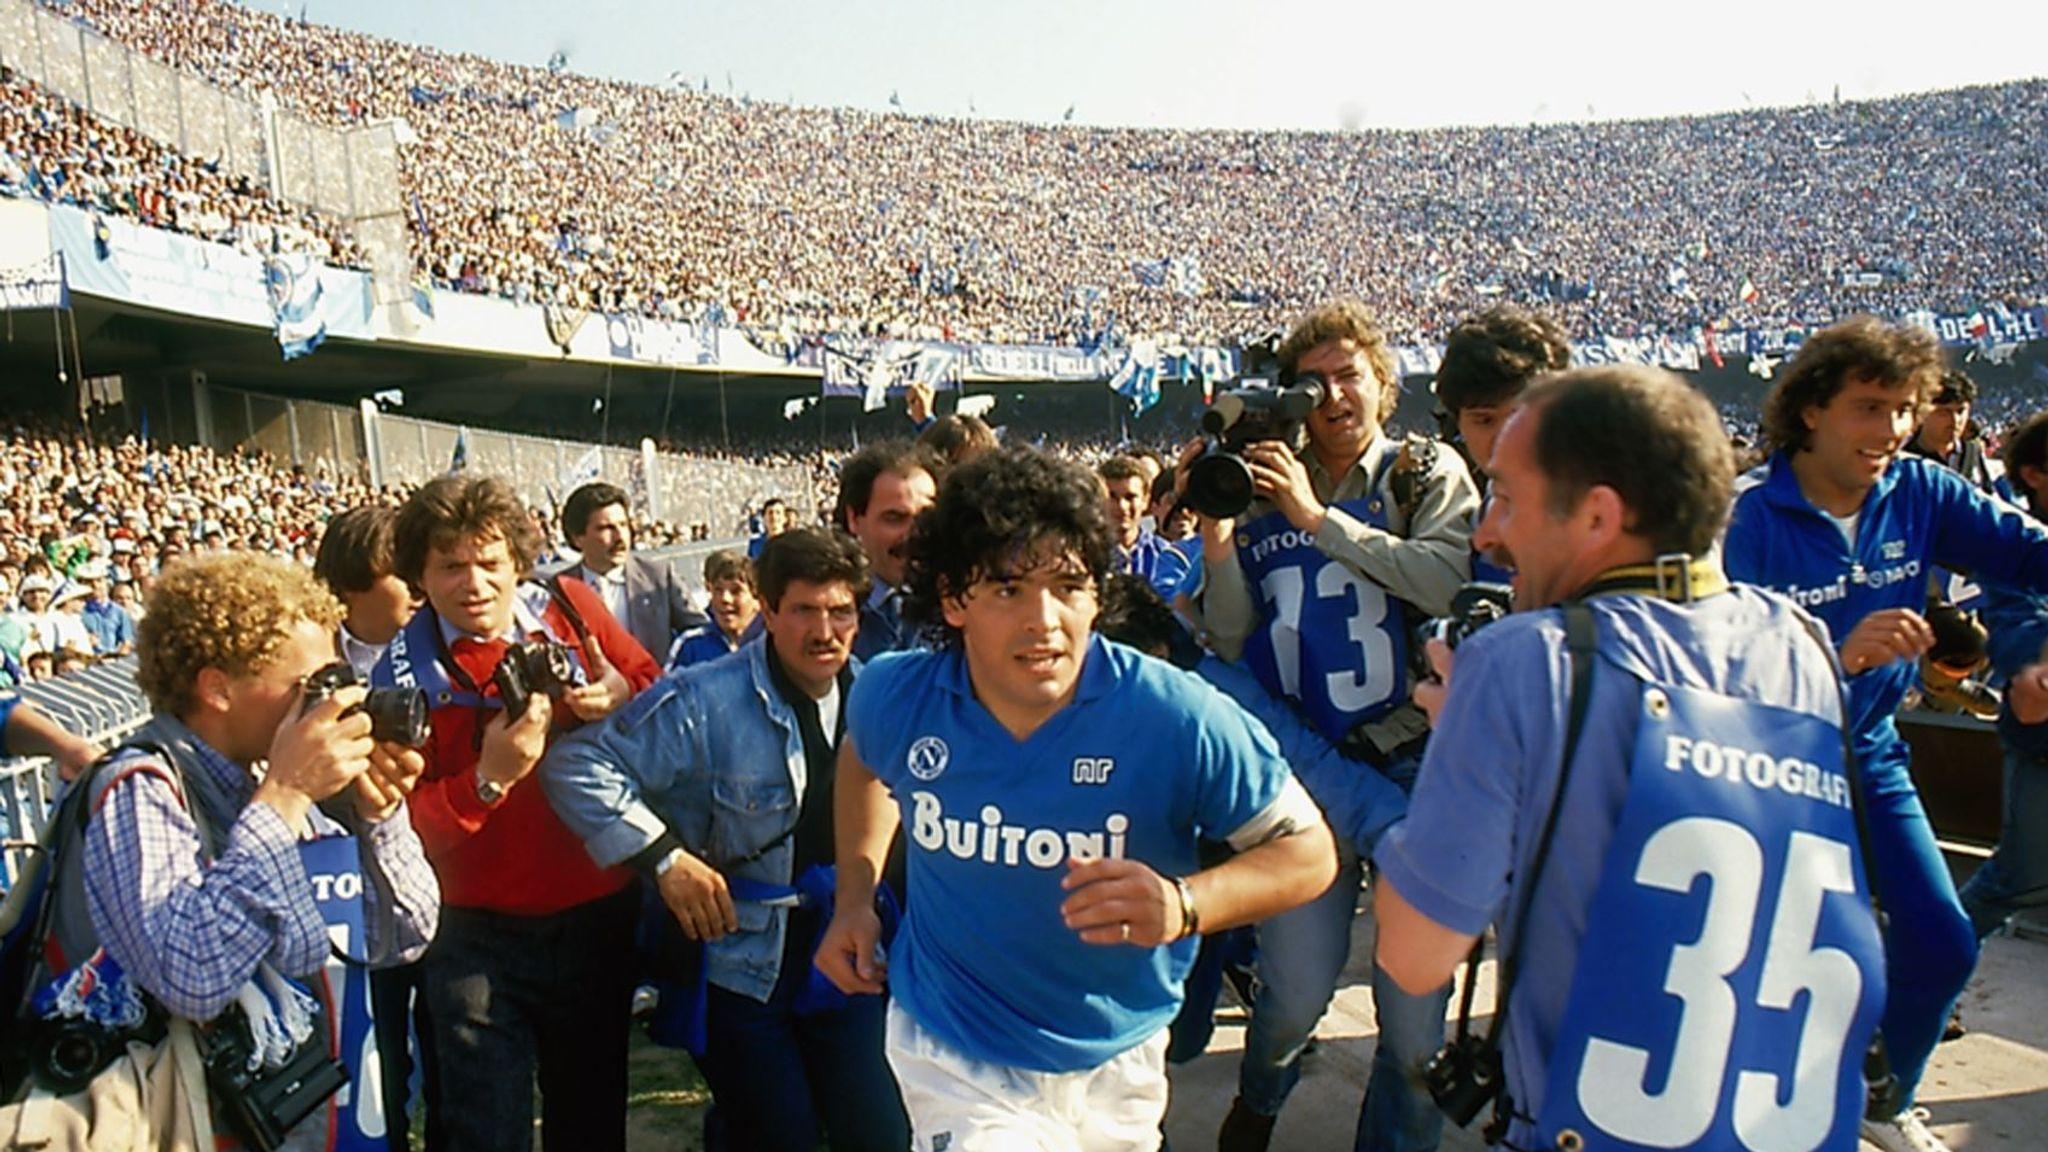 Calcio Saga 20/21 - Page 33 Skysports-diego-maradona-napoli_4687947